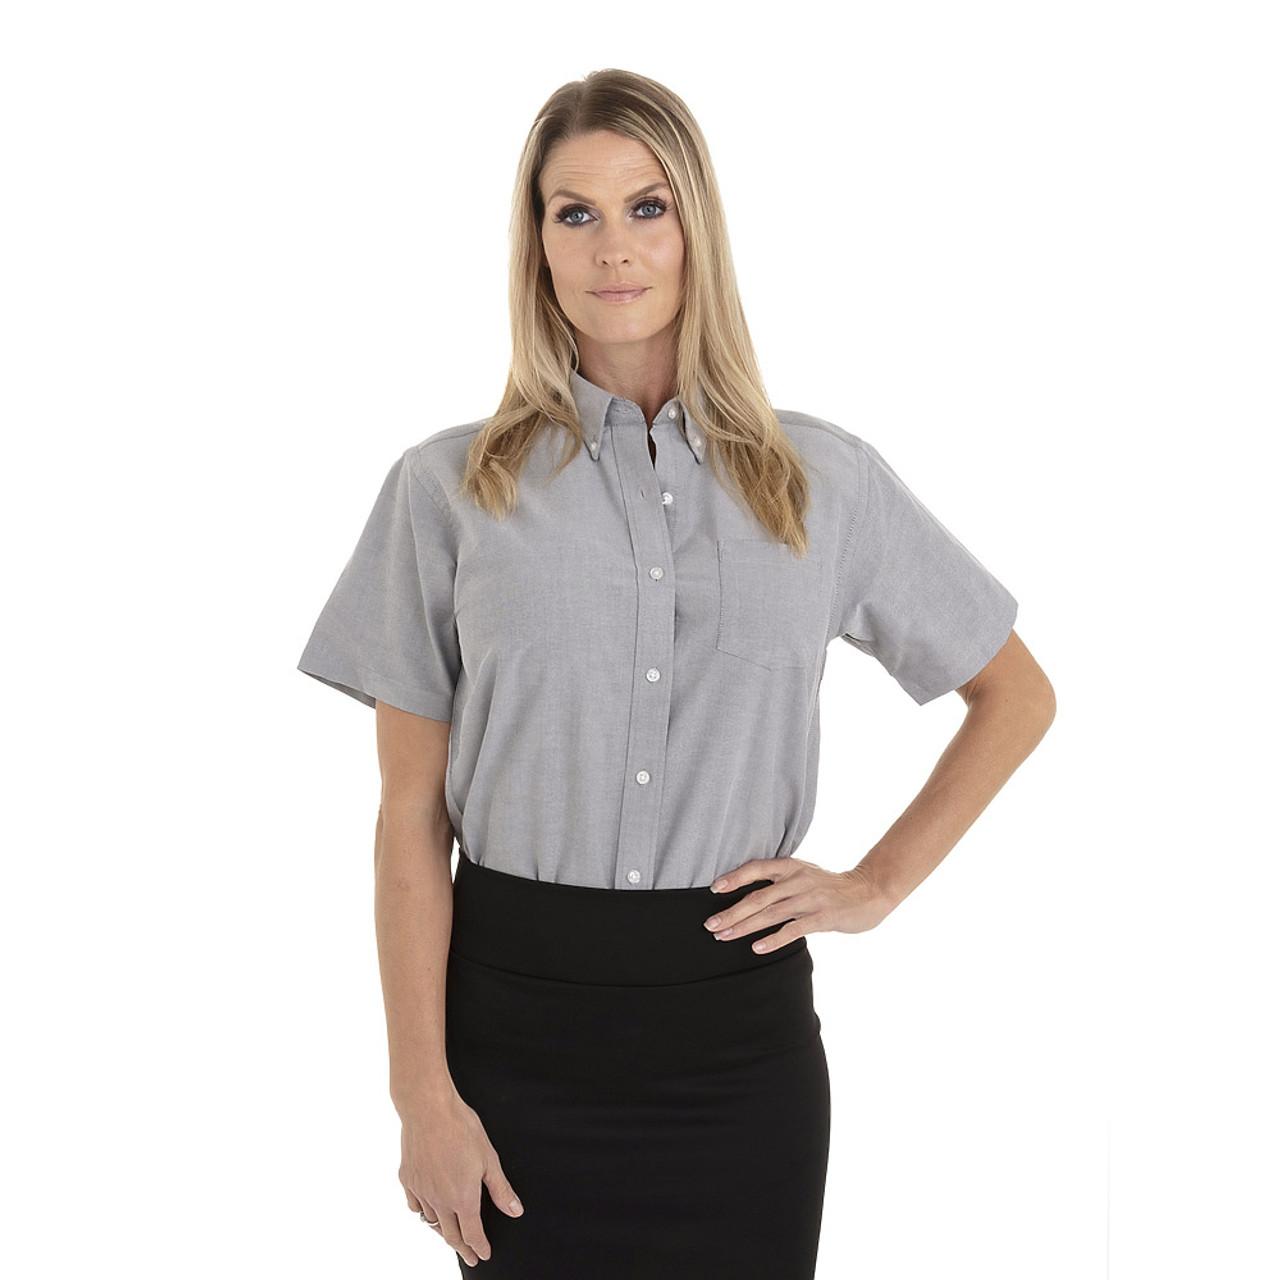 Greystone - 18CV301 Van Heusen Ladies' Short Sleeve Oxford Shirt -T-shirt.ca